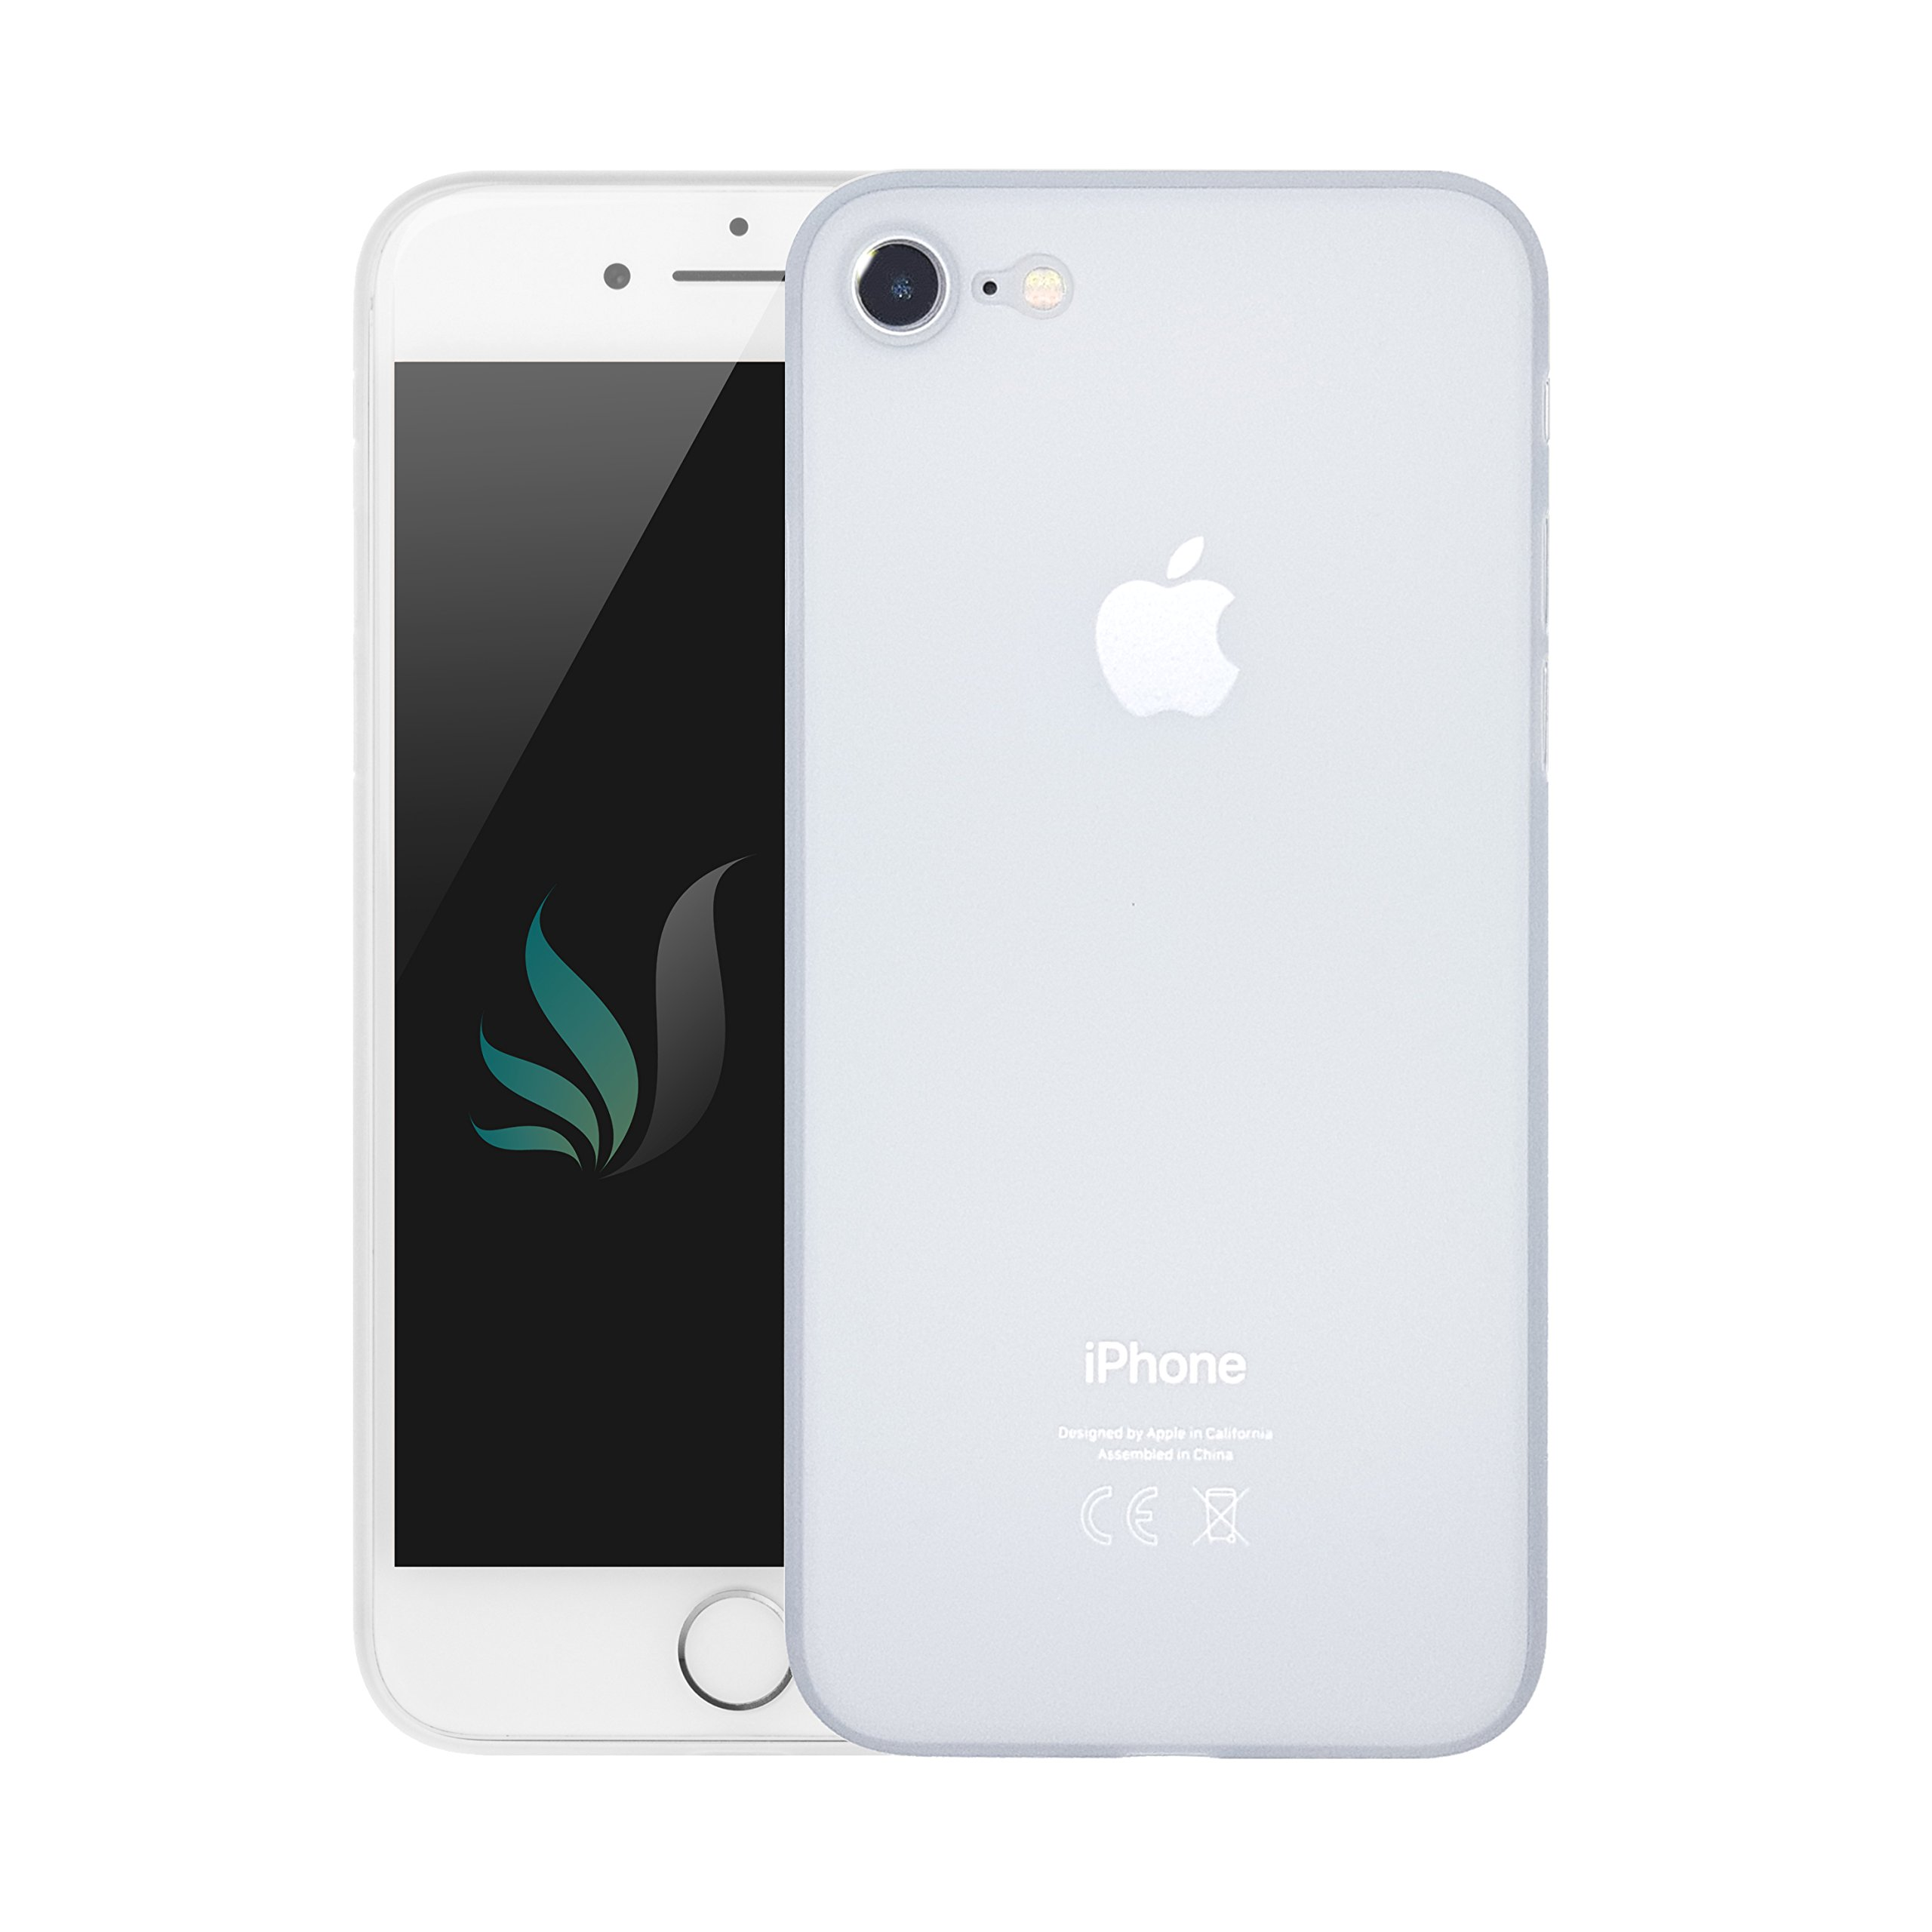 I-Spring IPhone 7/8 Hülle Silikon transparent dünn crystal clear (IPhone 7/8, transparent)